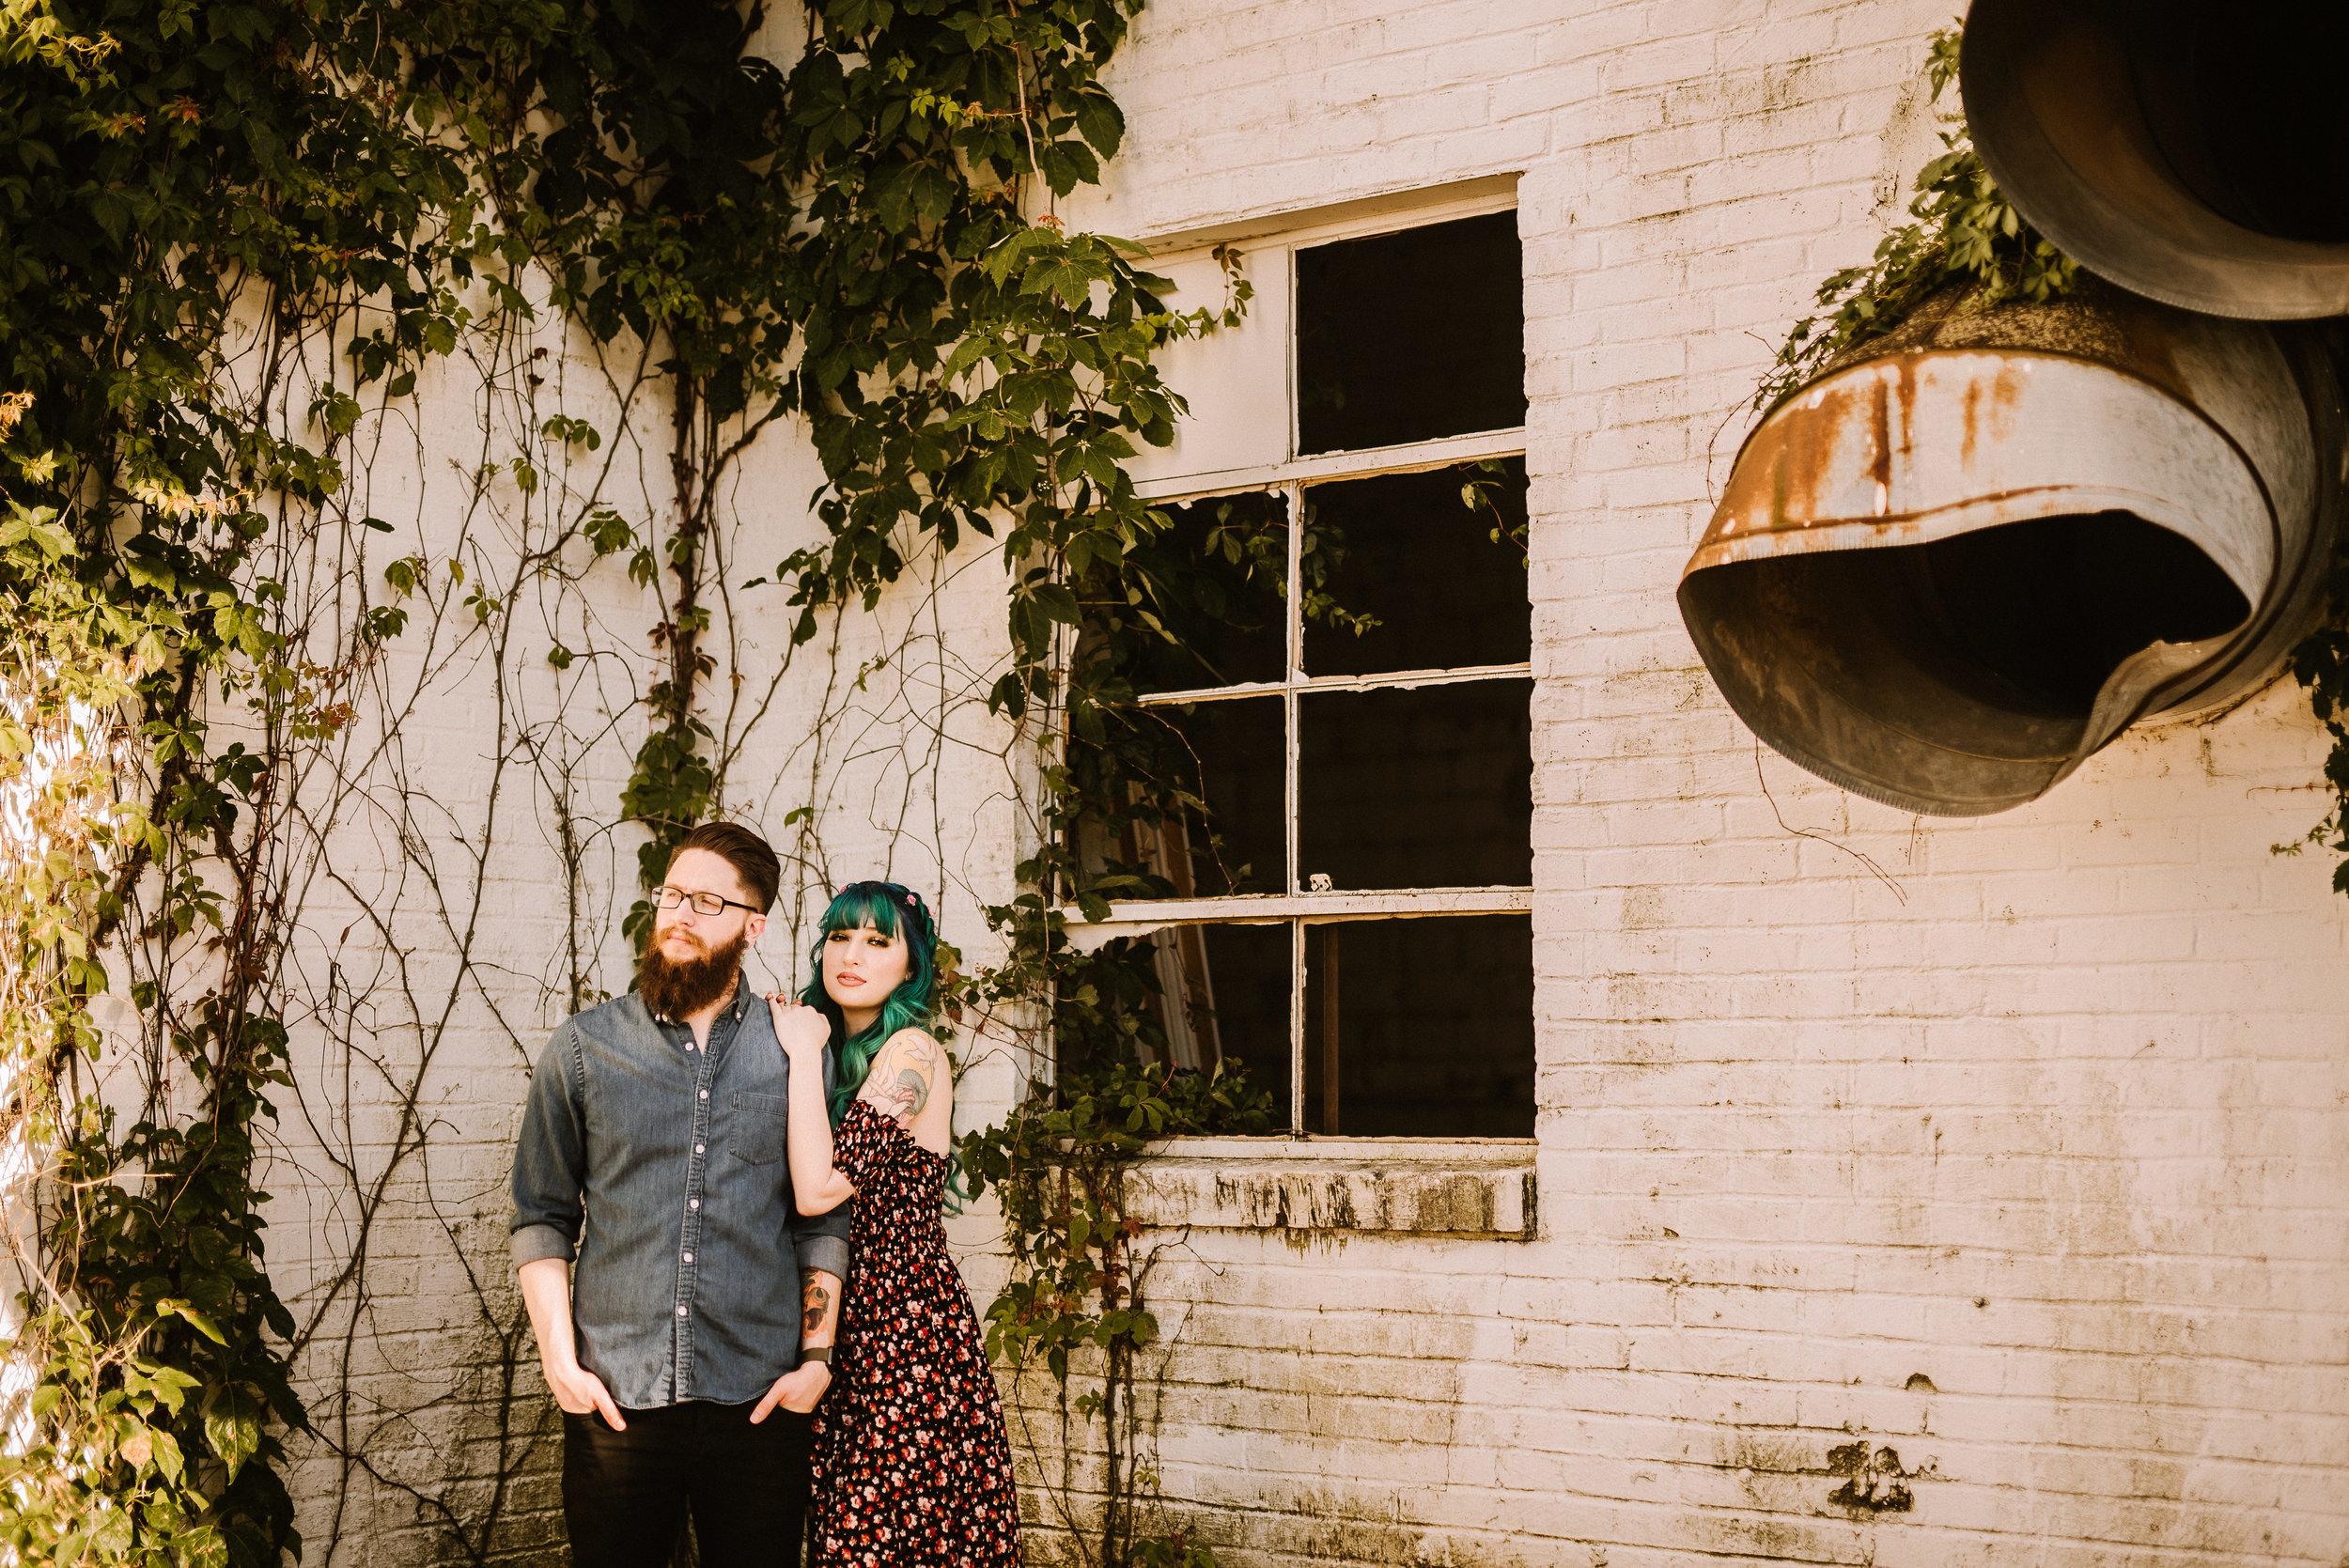 Kelly & Matt_Engagement Session_Wilson Arkansas_Ashley Benham Photography-105.jpg